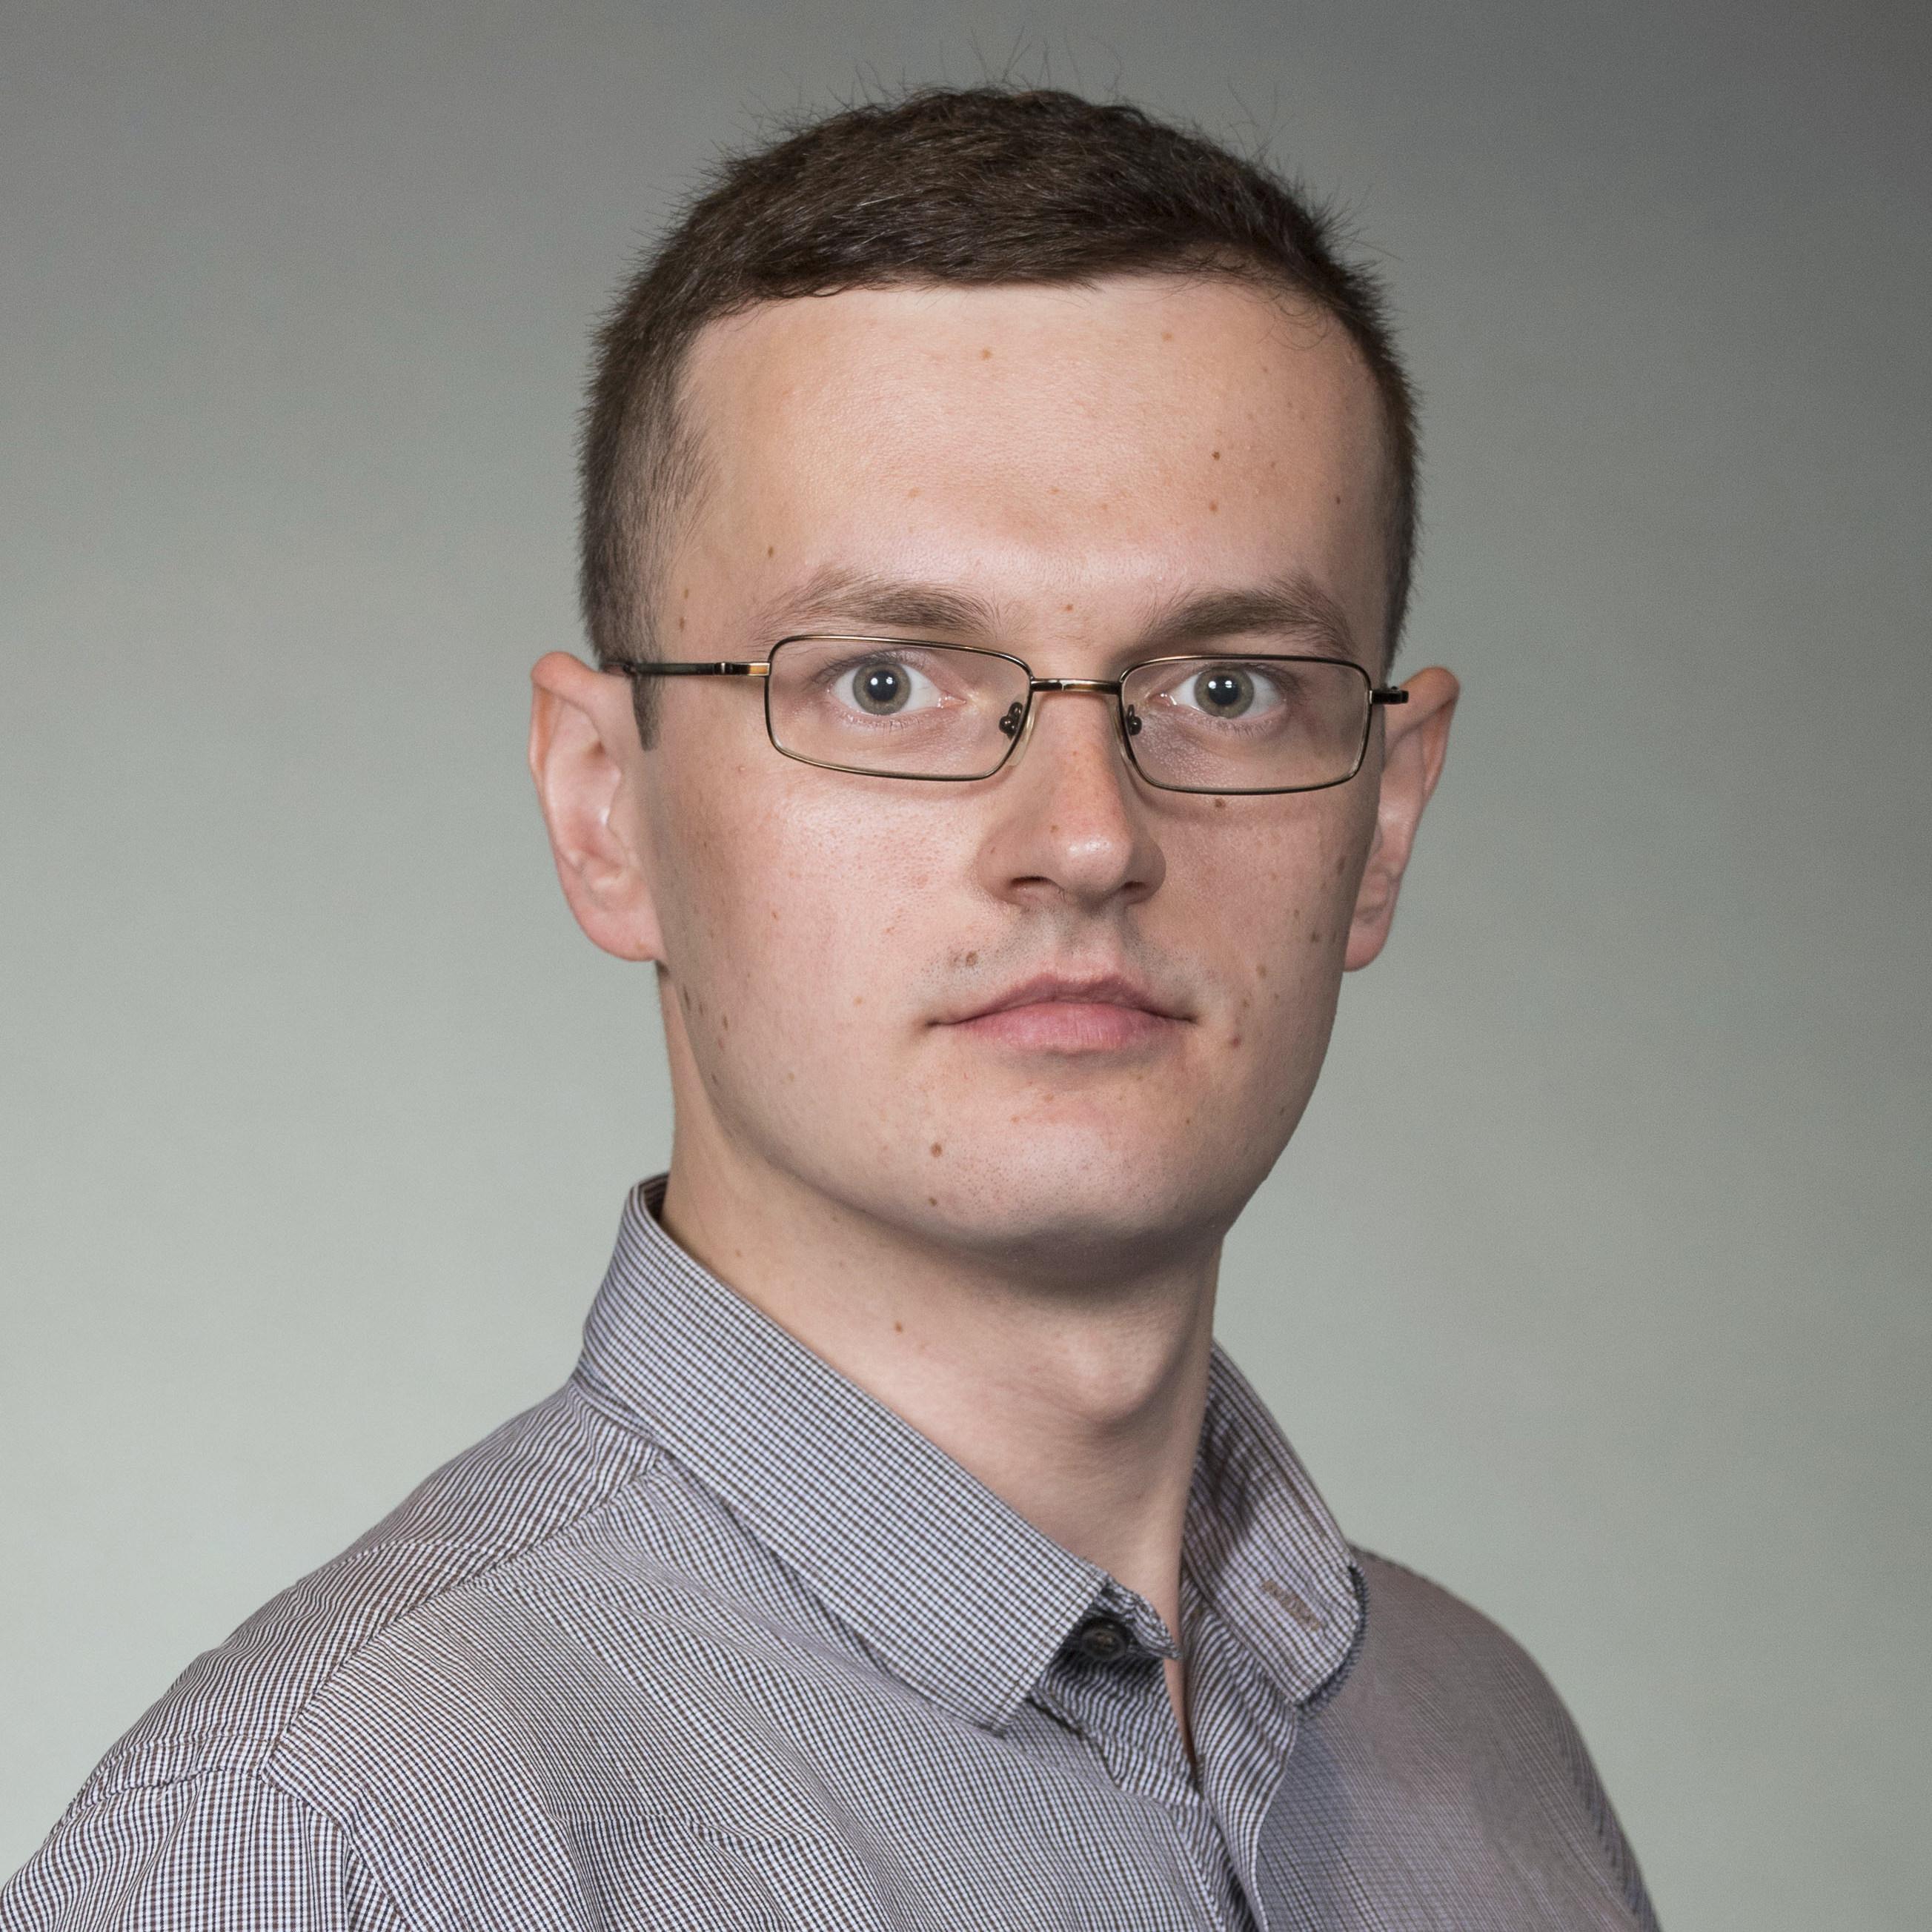 Headshot of Yurii Piadyk